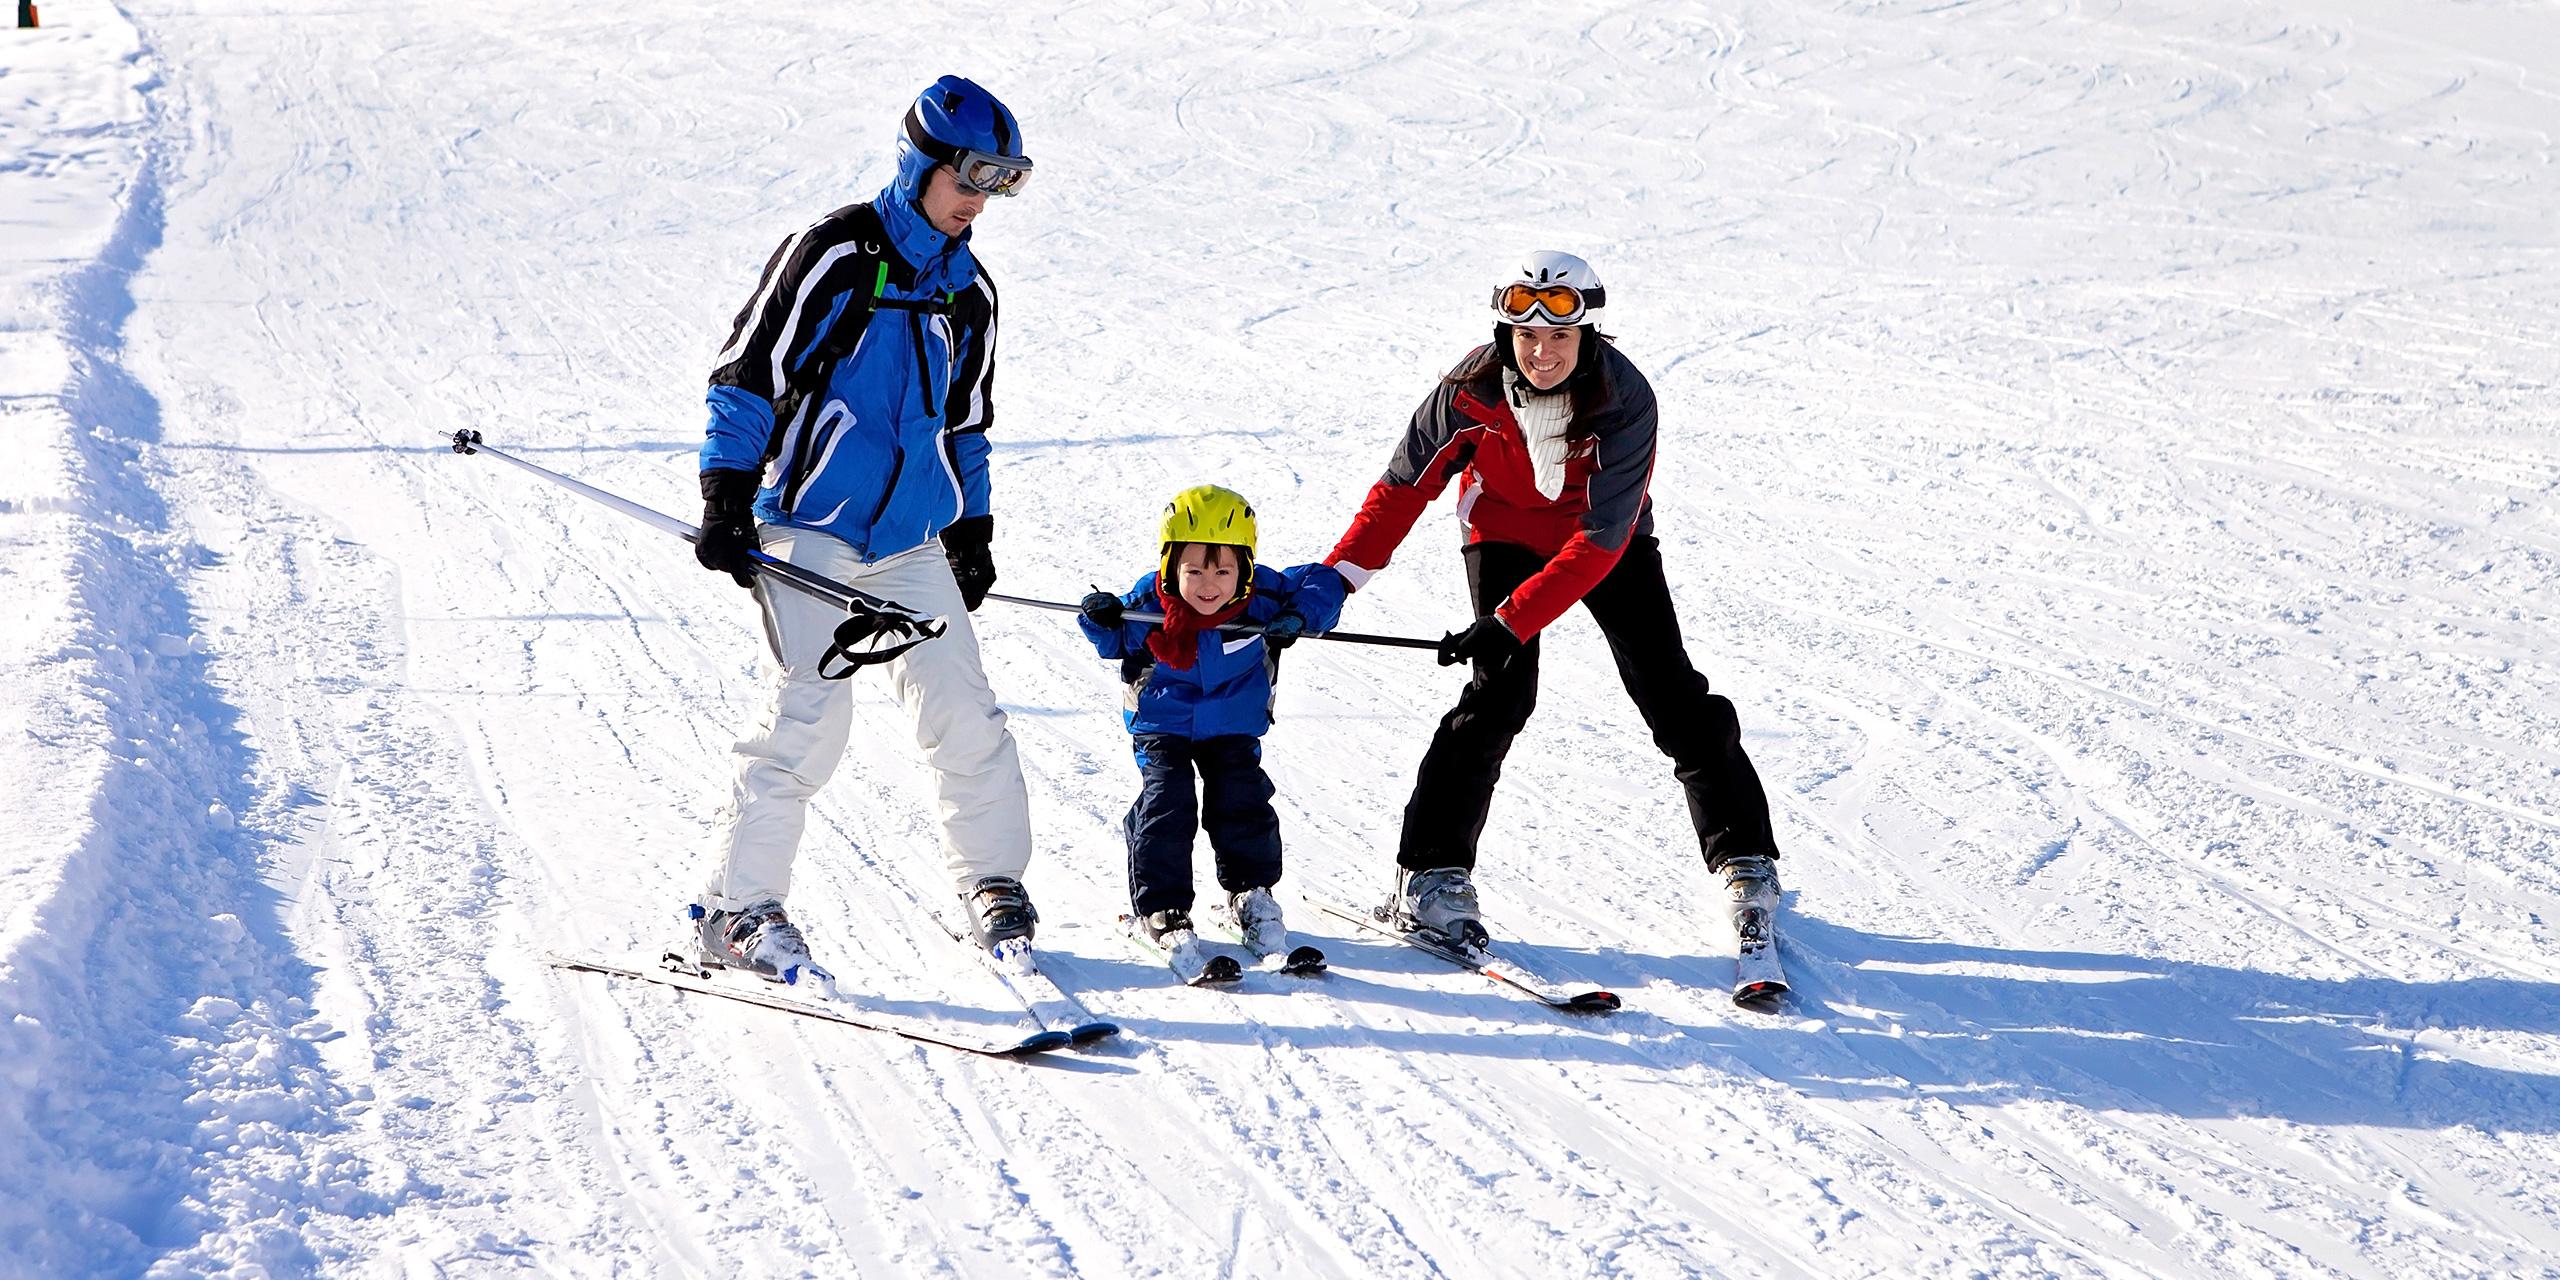 Family learning ski; Courtesy of Tomsickova Tatyana /Shutterstock